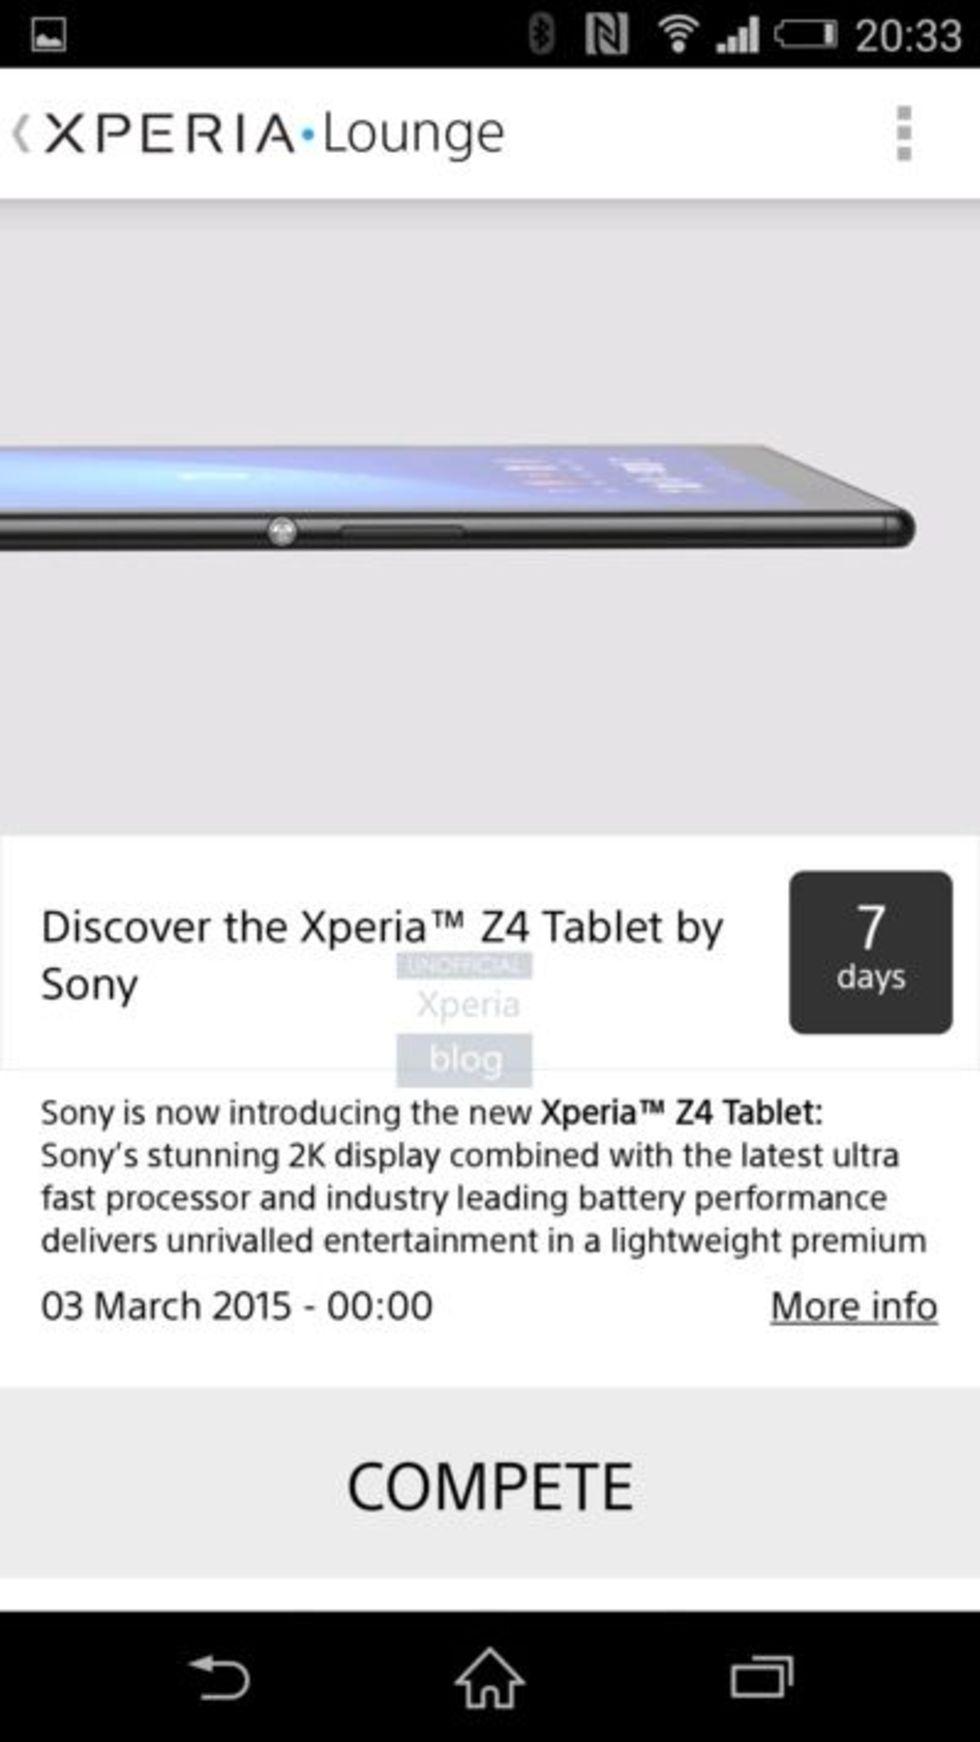 Sony råkar utannonsera Z4 Tablet i Xperia Lounge